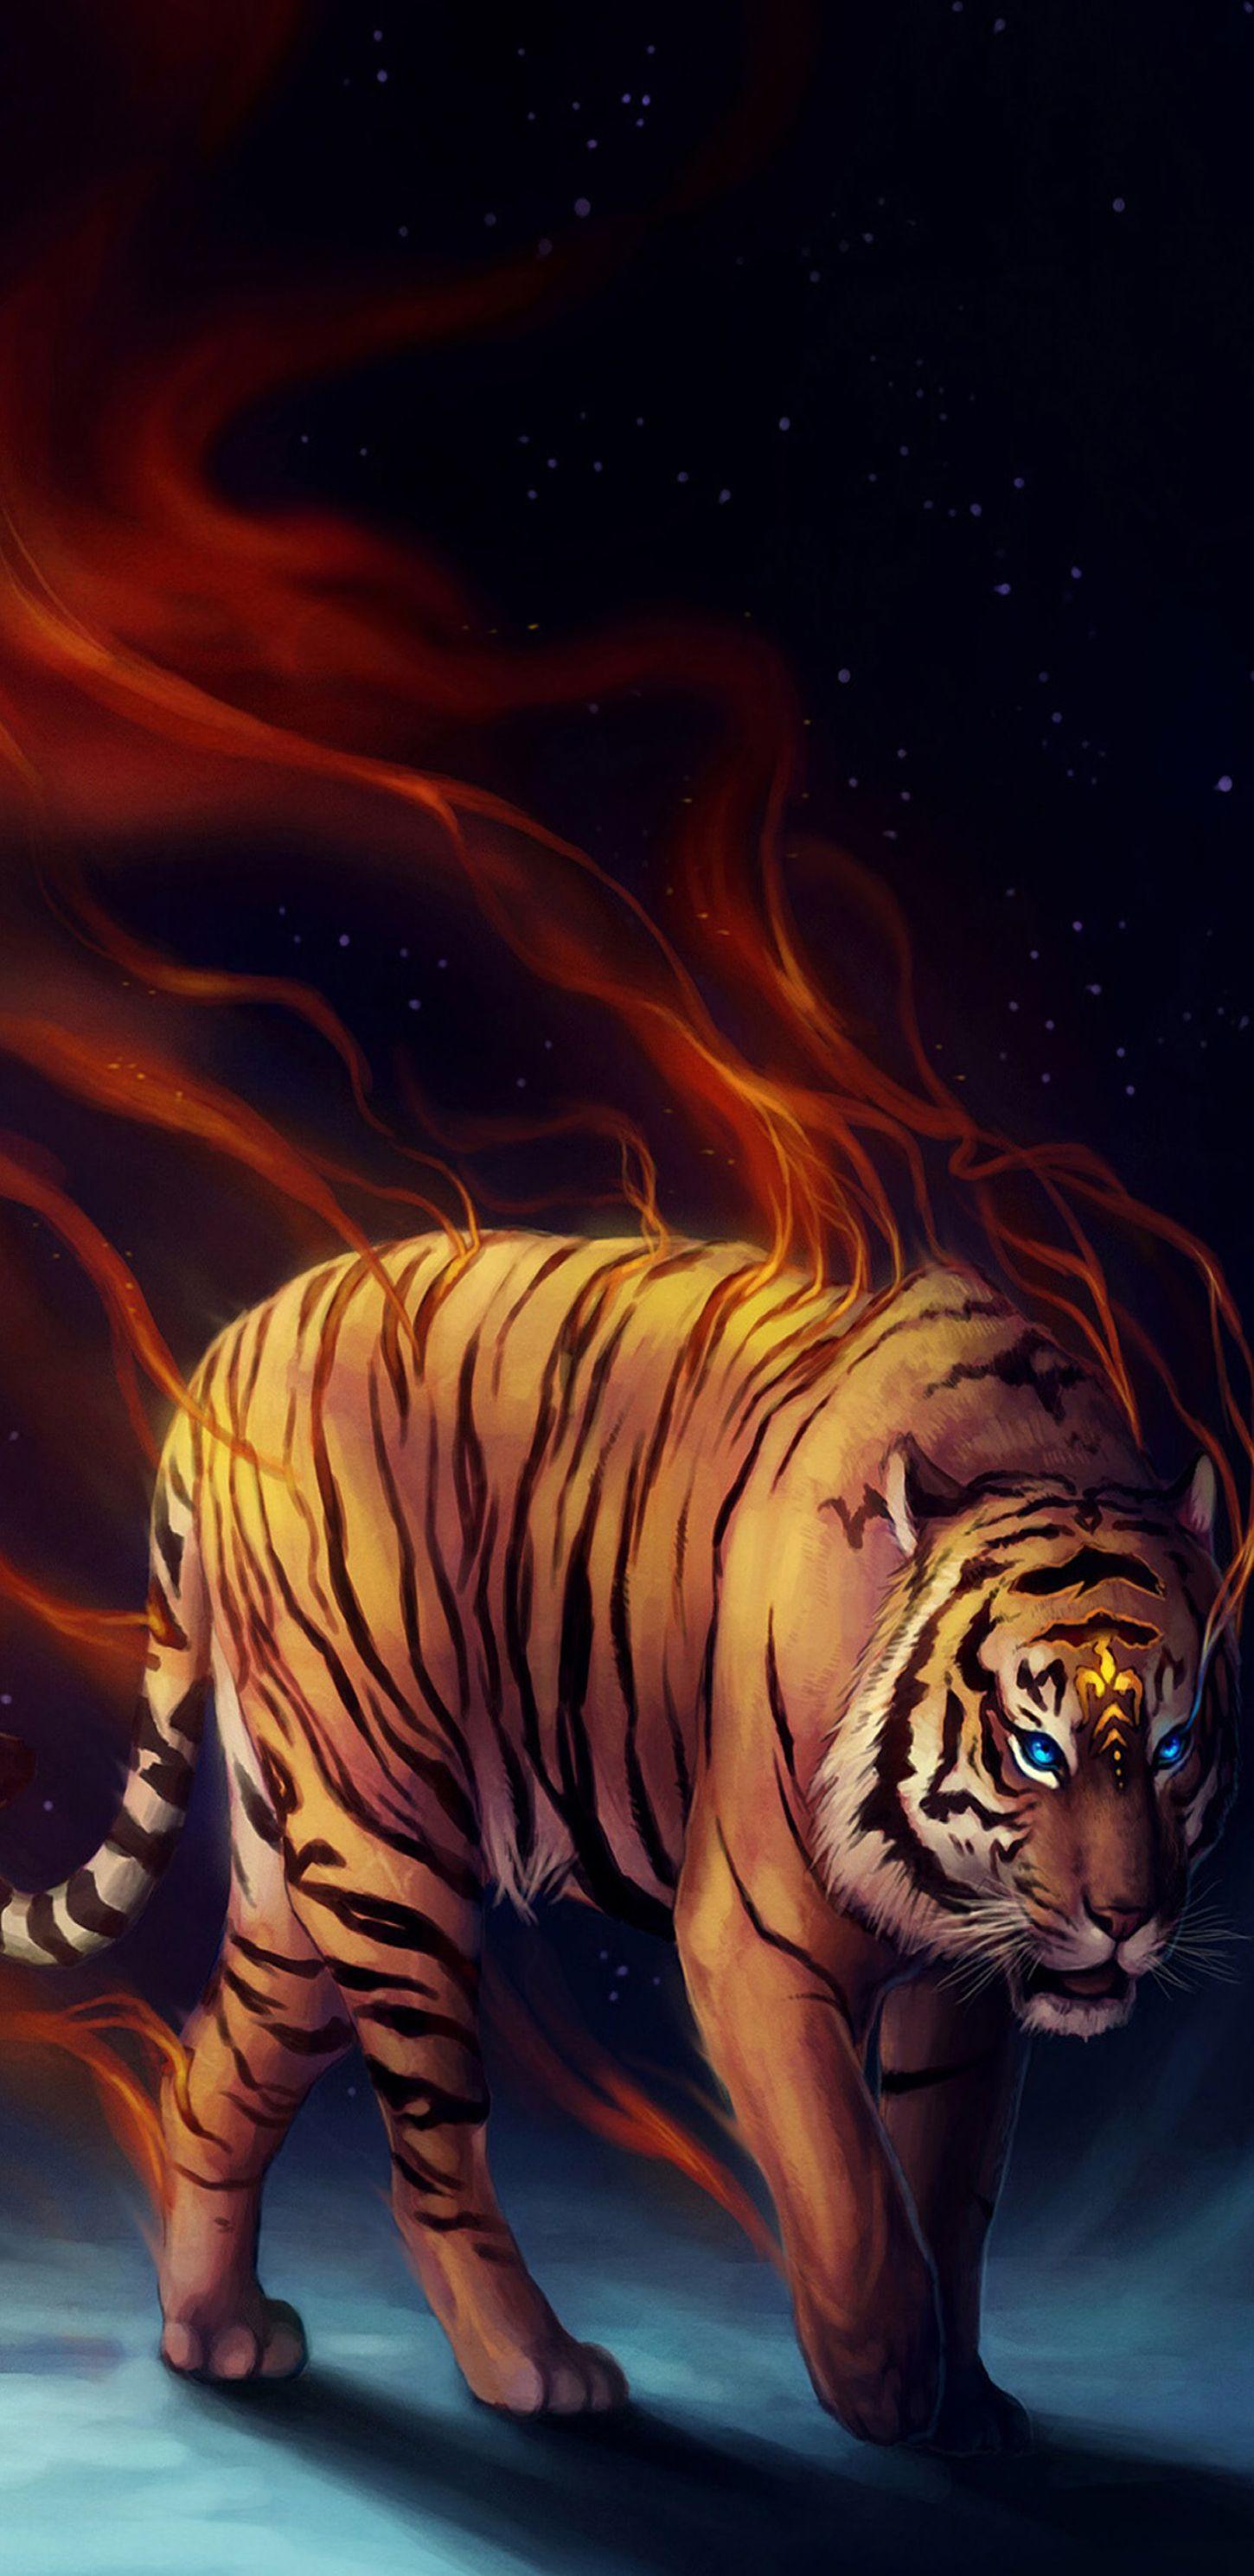 Tiger Black Red Dark Wallpaper Pattern Galaxy Colour Abstract Digital Art S8 Walls Samsung Oboi Dlya Telefona Oboi